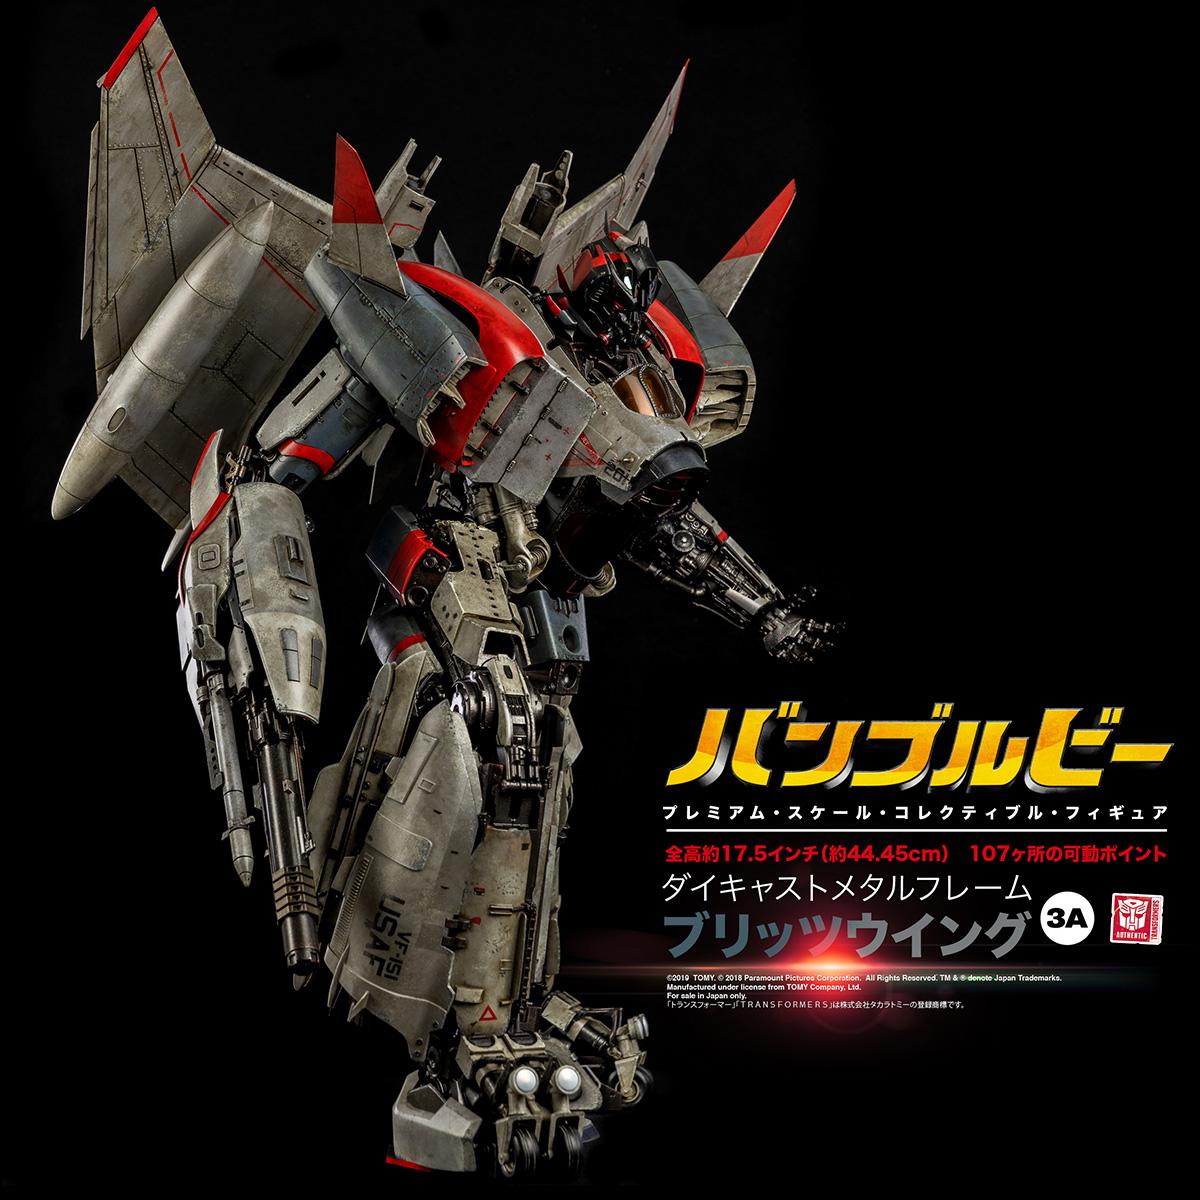 Blitzwing_PM_JAP_1050.jpg